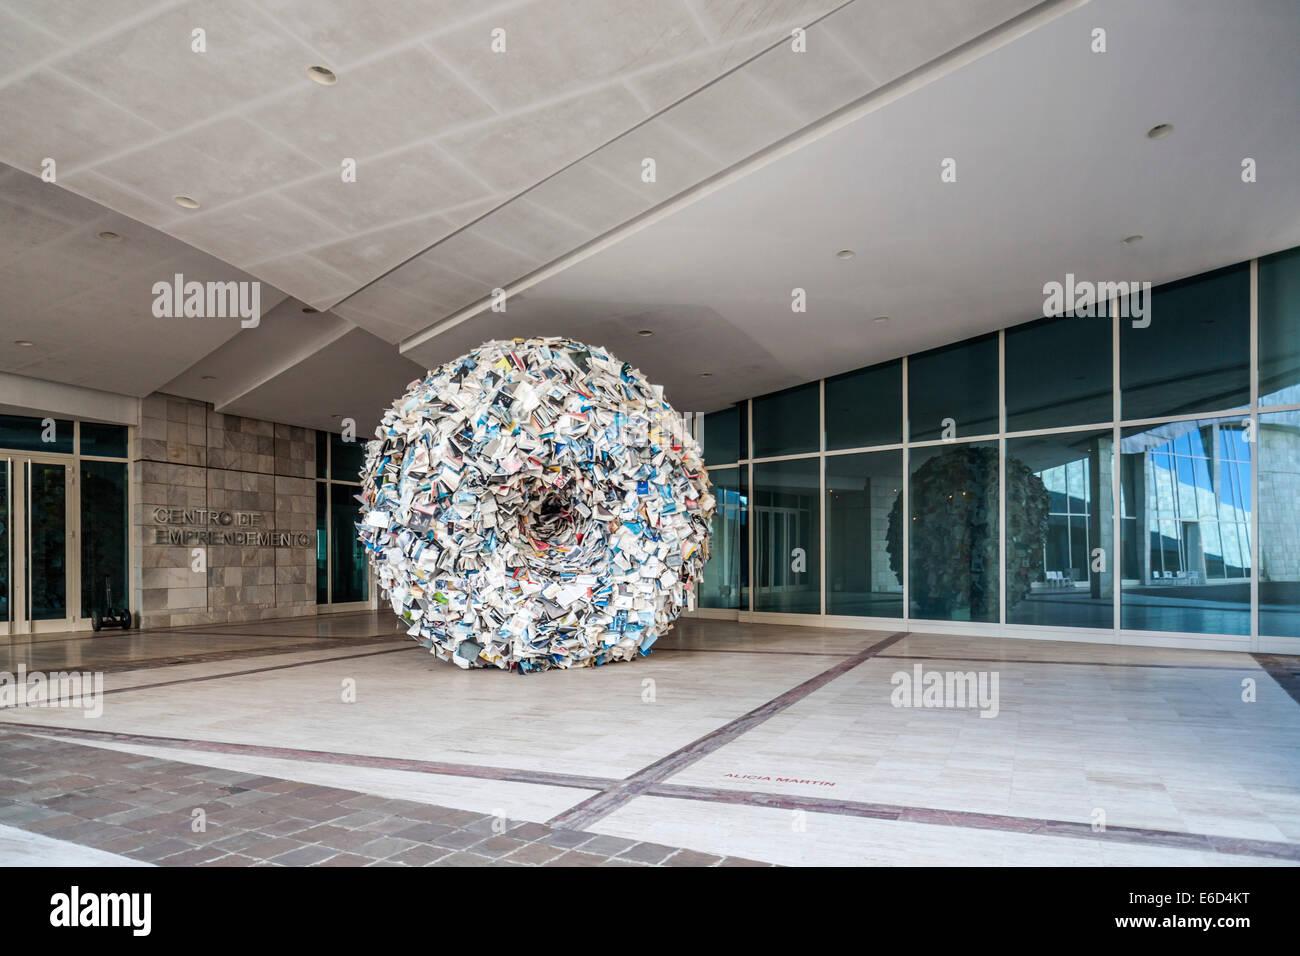 Santiago de Compostela. Cidade cultura galicia designed by Peter Eisenman - Stock Image